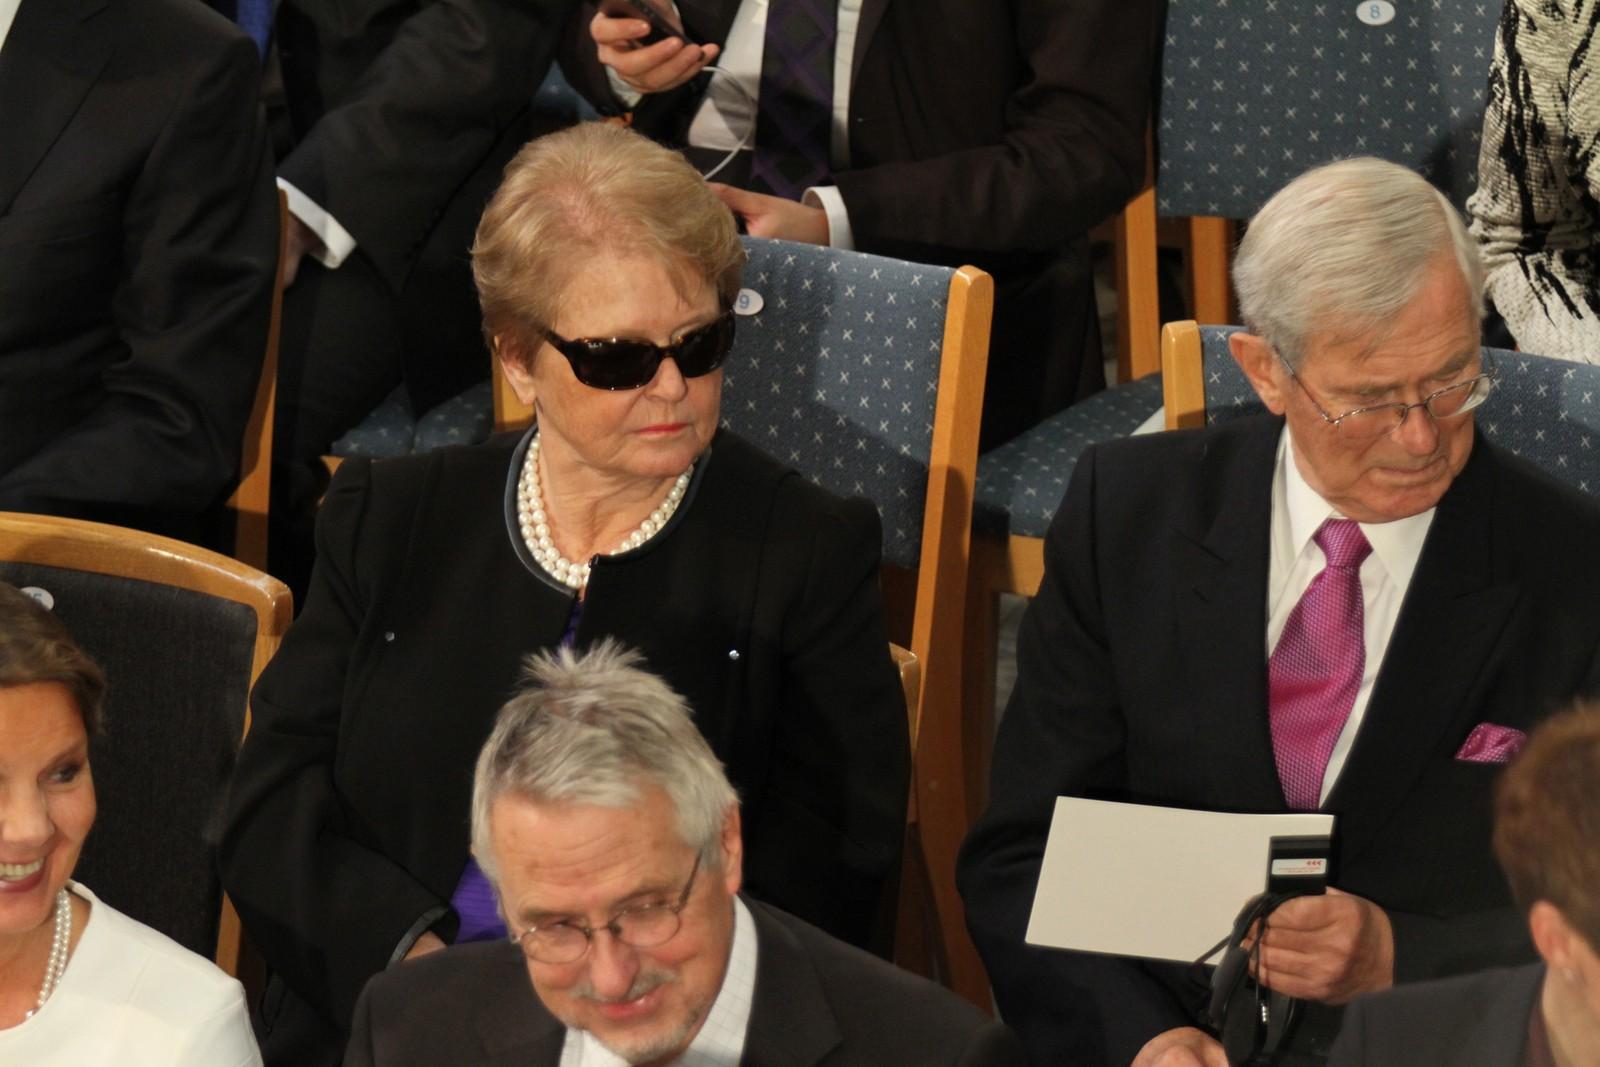 SAMFUNNSTOPPER: Tidligere statsminister Gro Harlem Brundtland er blant tilhørerne.